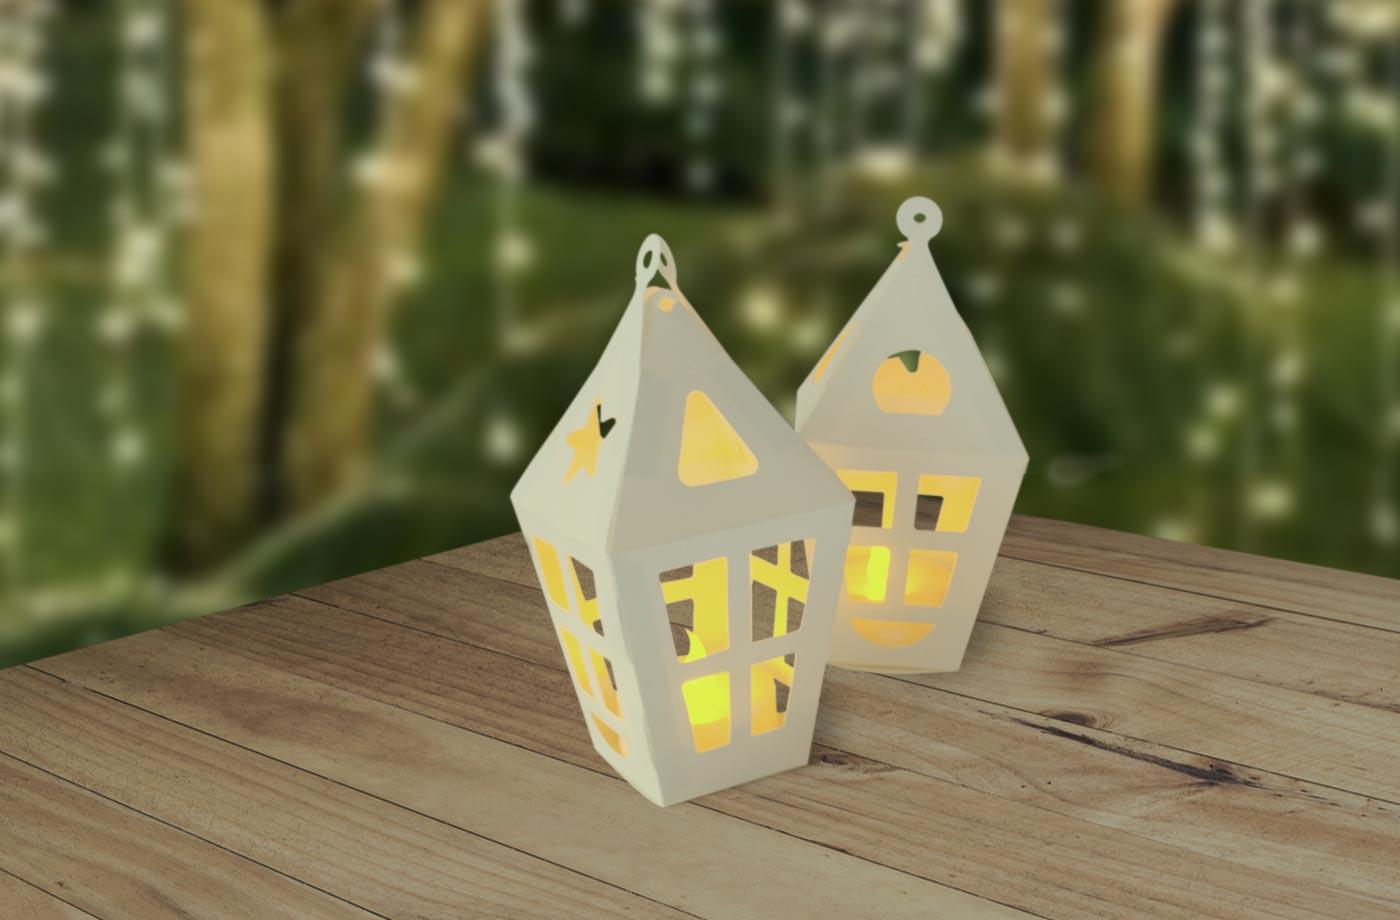 Lanterne photophore 3 3701310203750